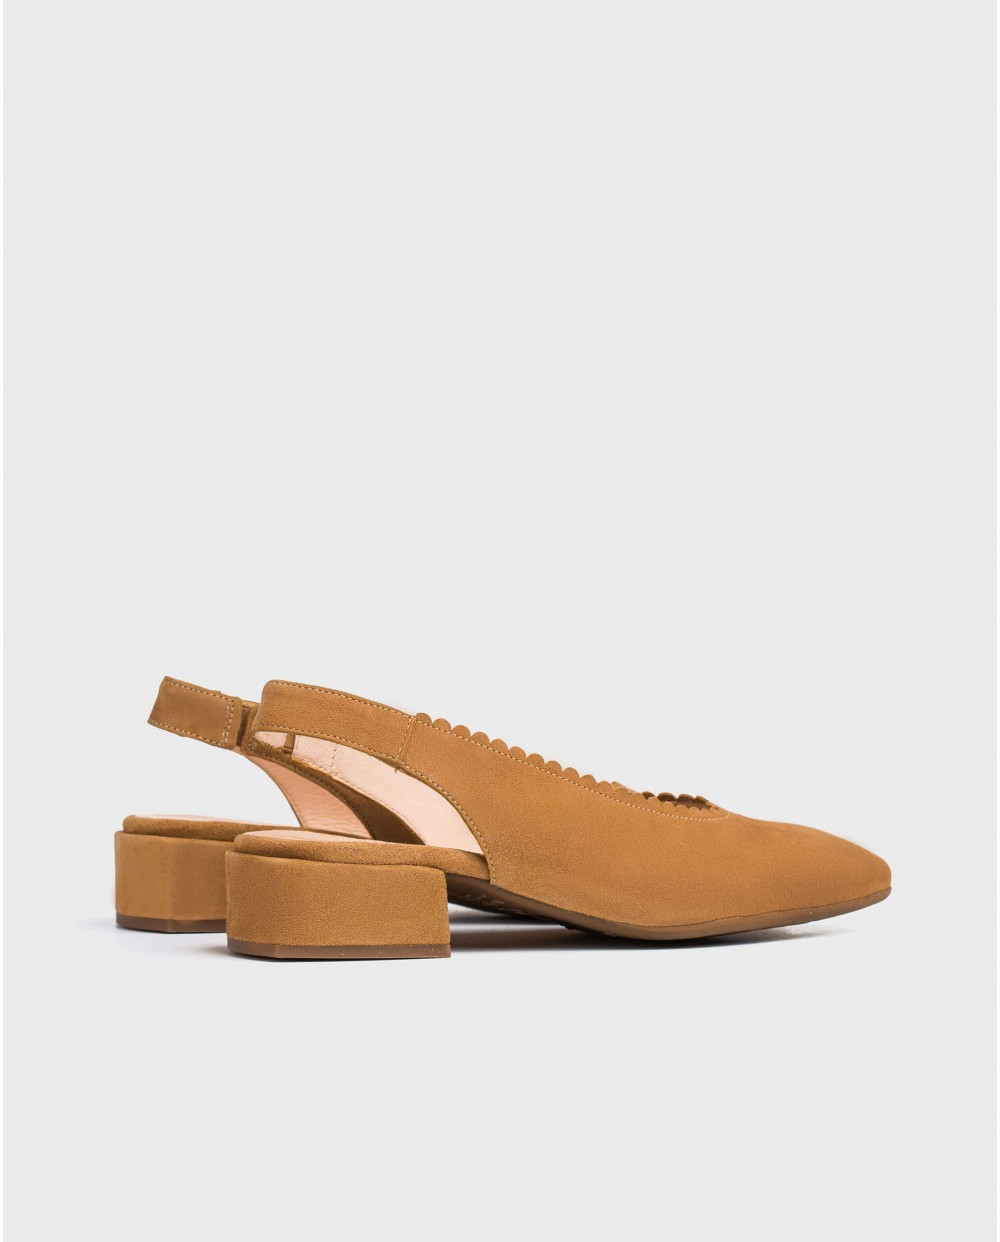 Wonders-Heels-shoe with a semi/circle cut detail